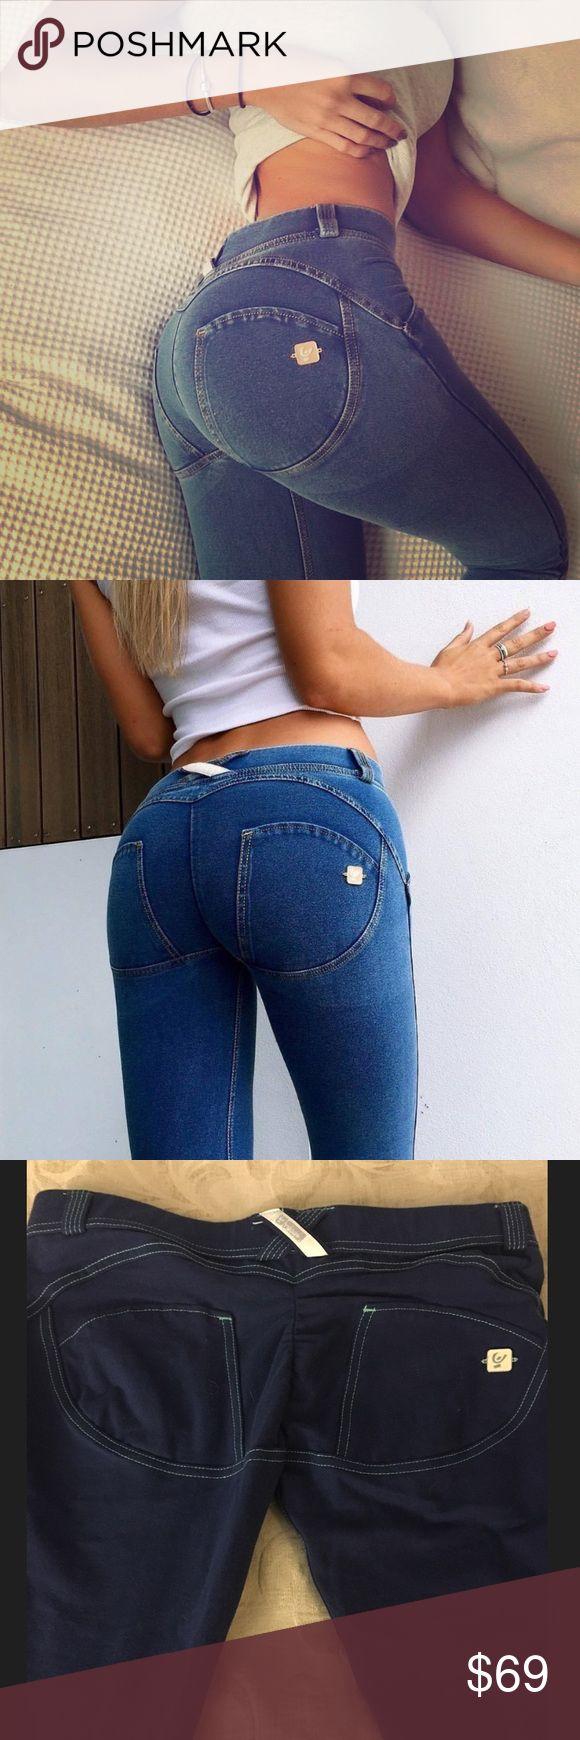 23 best freddy jeans images on pinterest sexy jeans. Black Bedroom Furniture Sets. Home Design Ideas